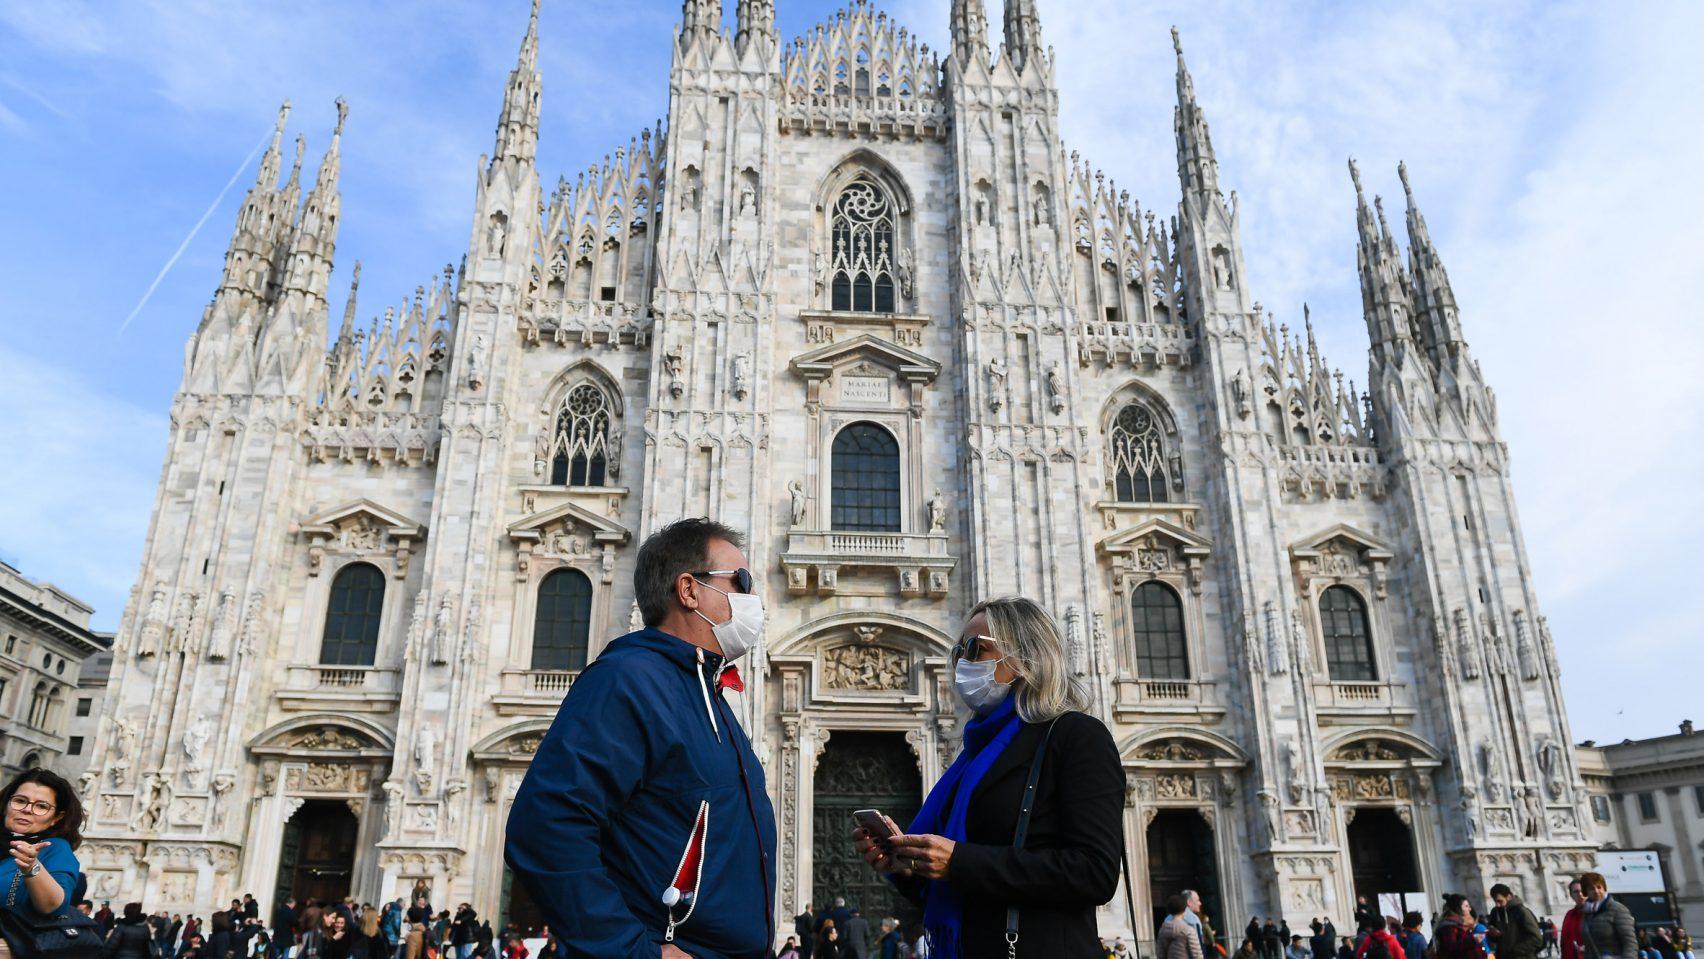 Milan salone del mobile furniture fair cancelled postponed coronavirus1 dezeen 2364 col 1 1704x959